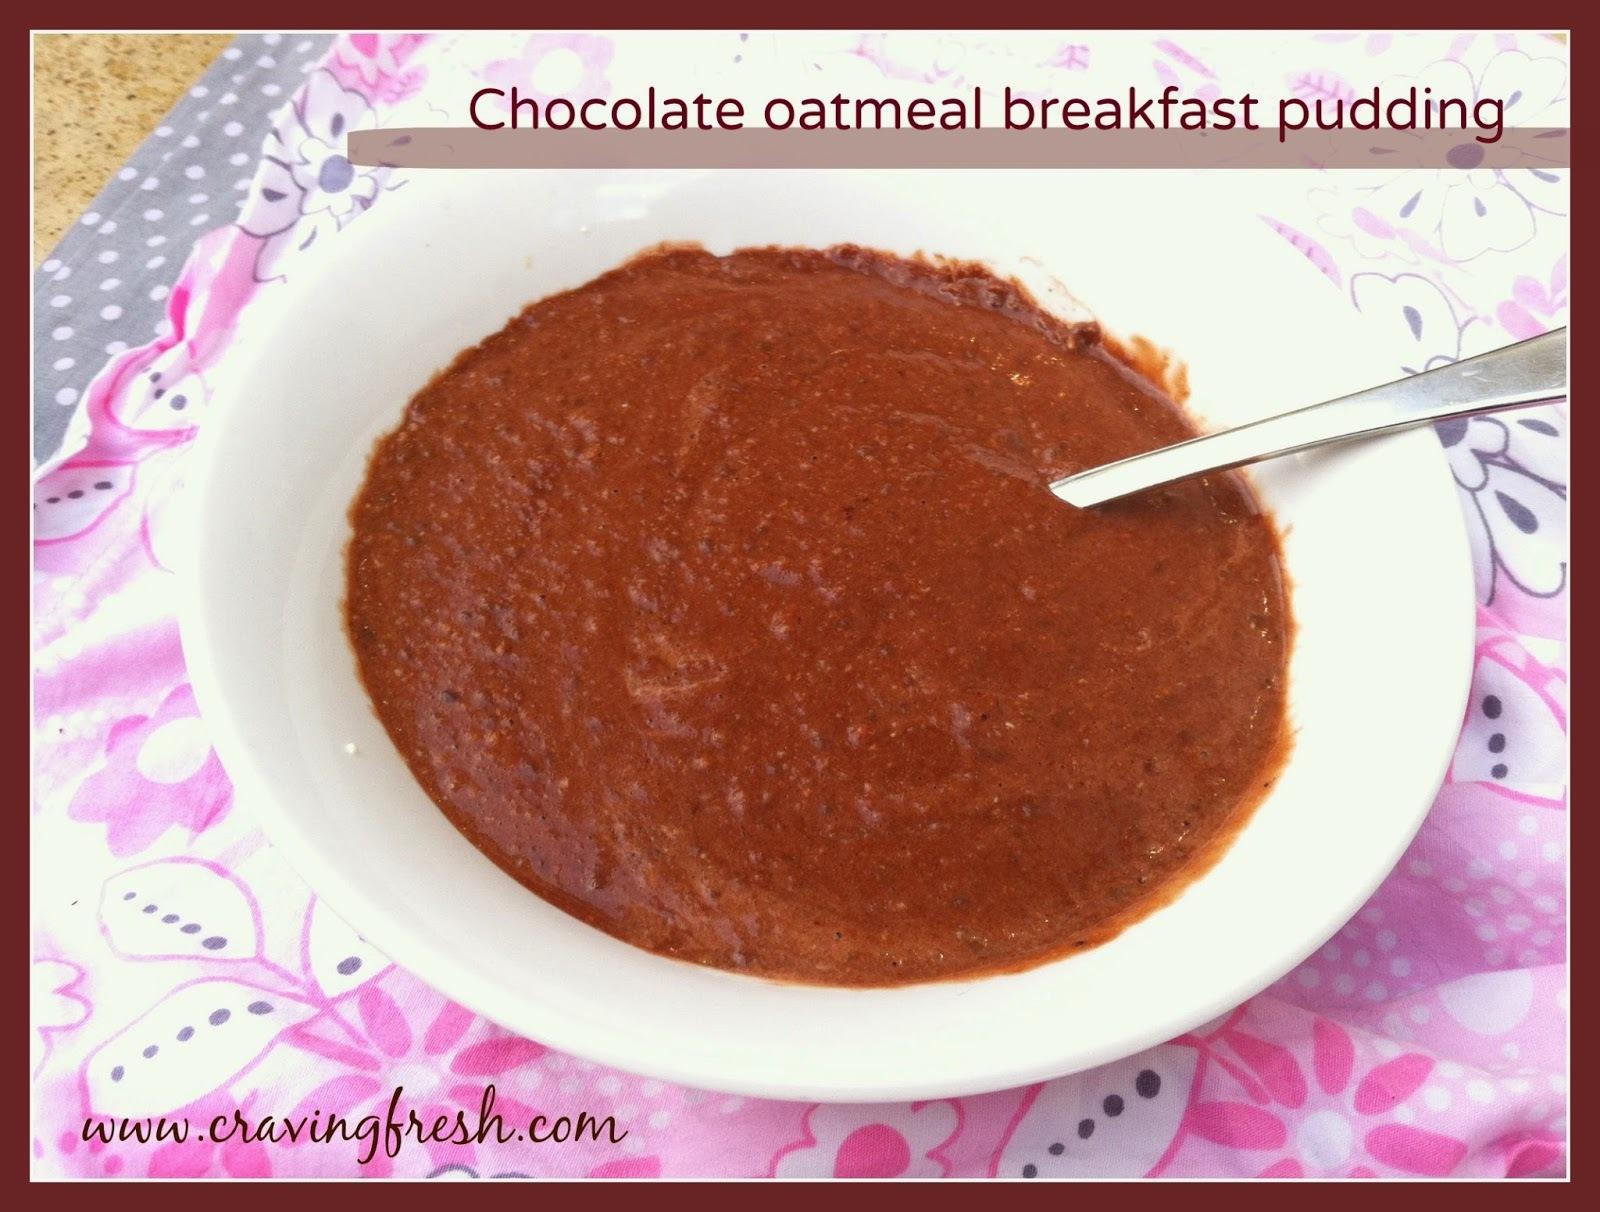 Chocolate oatmeal breakfast pudding recipe